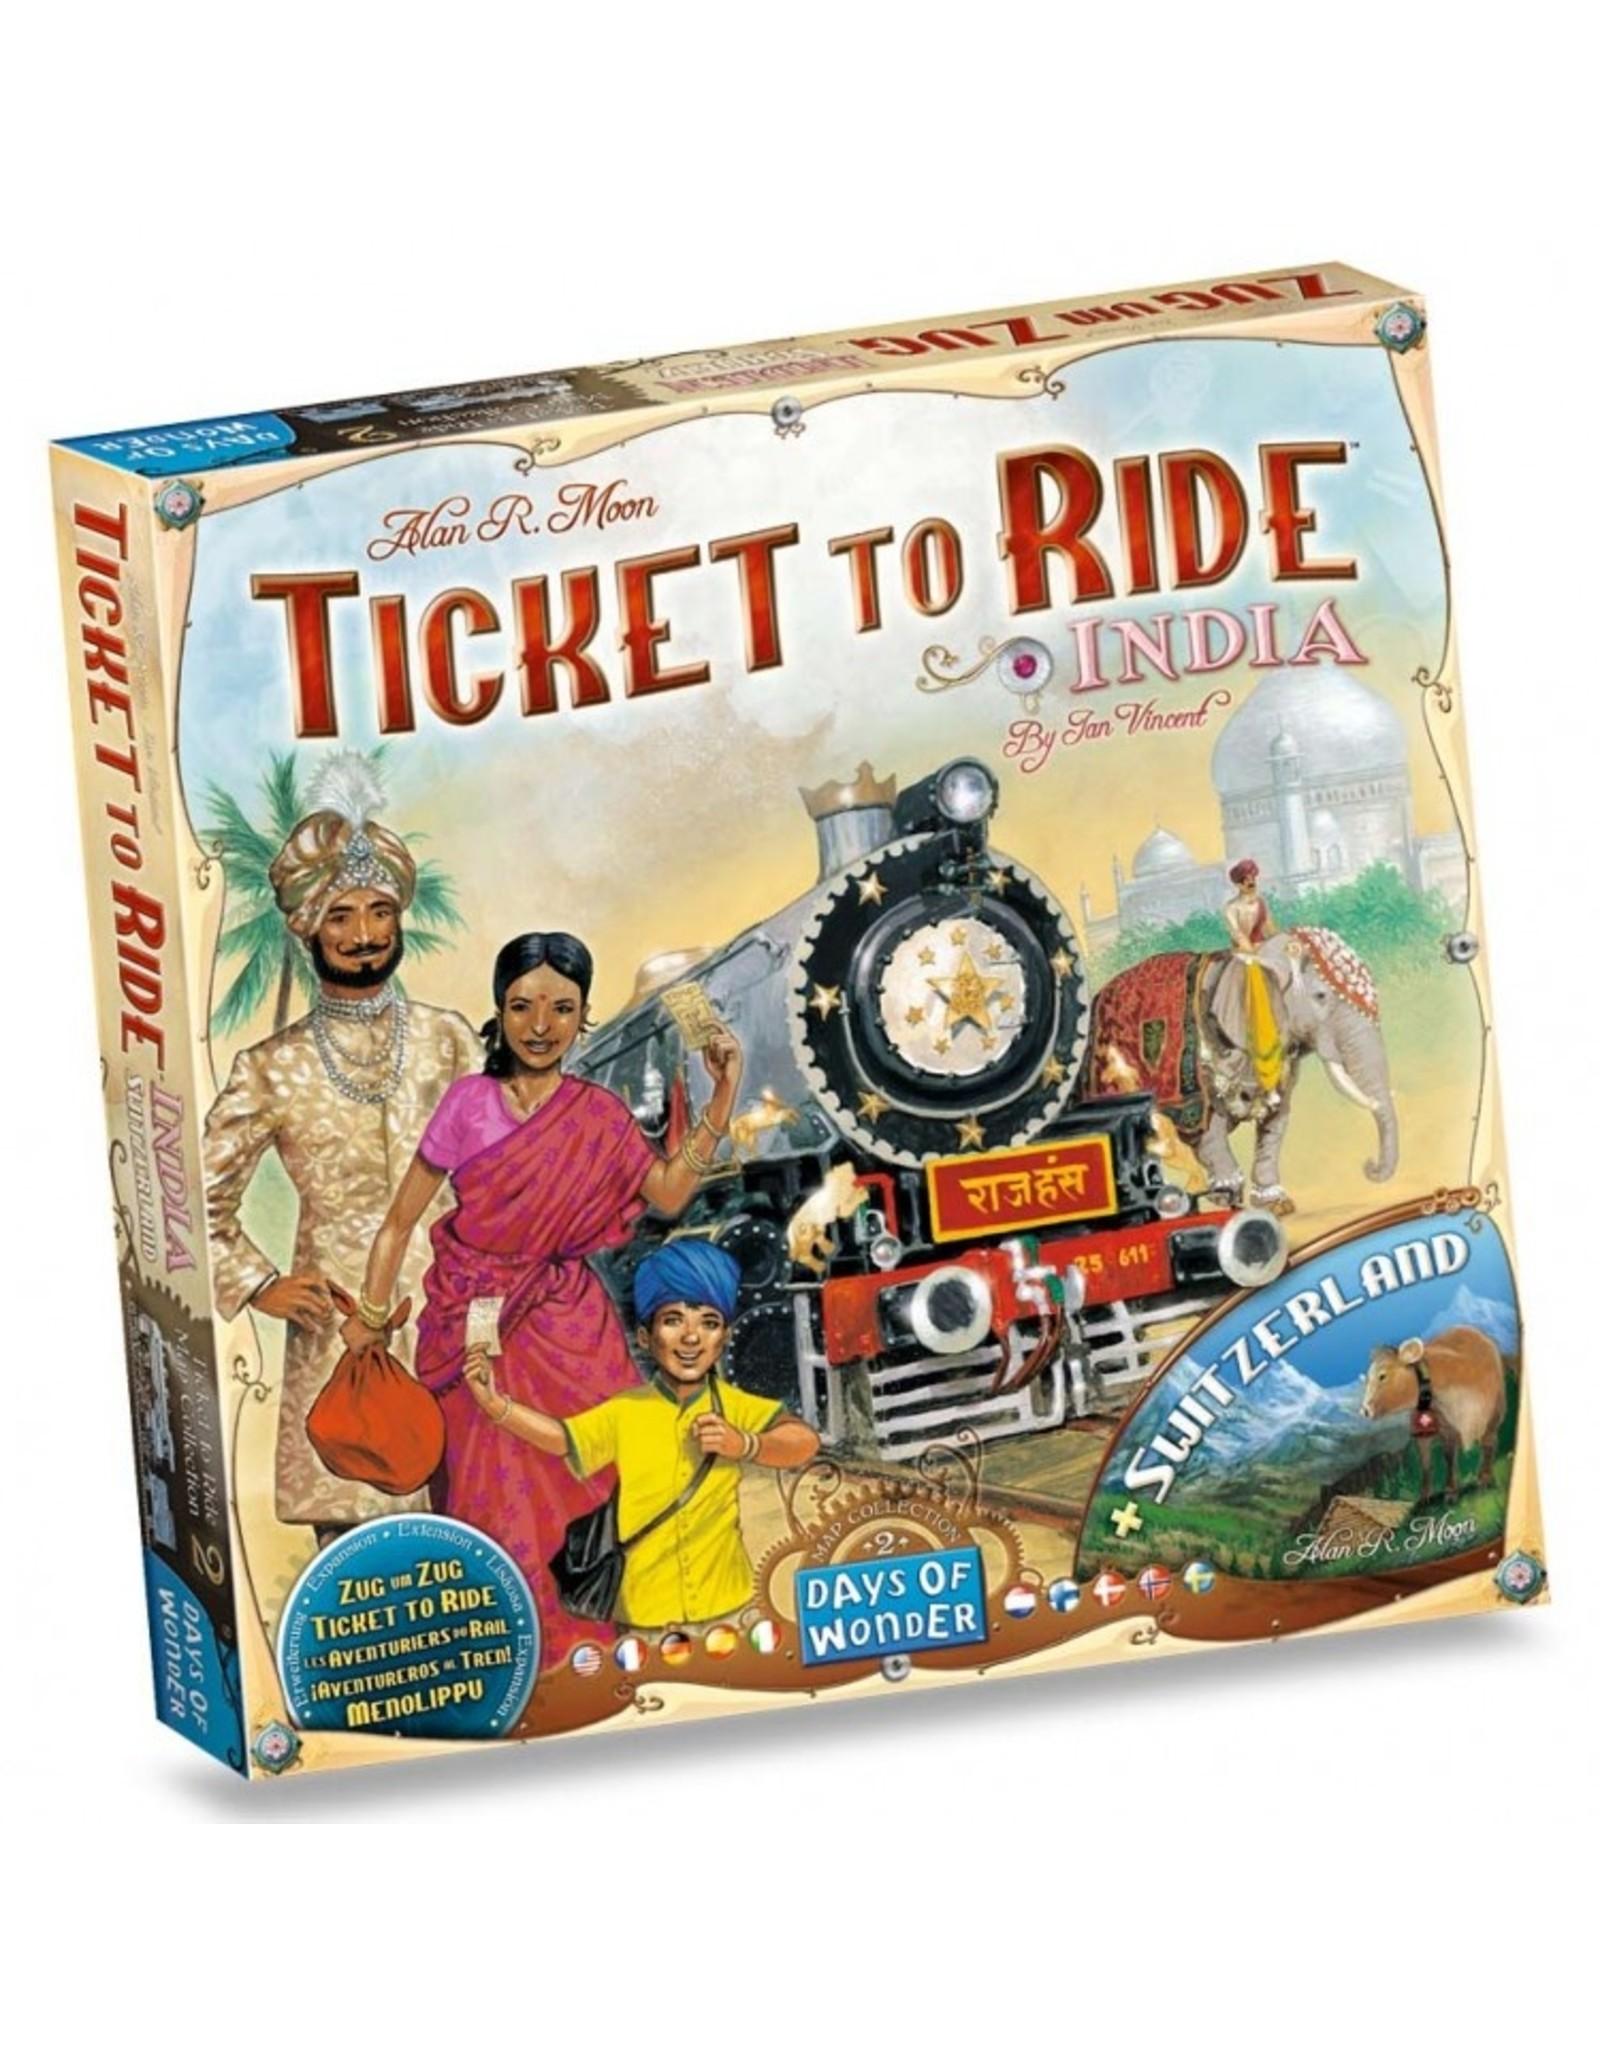 Days of Wonder Ticket To Ride India Maps Volume 2